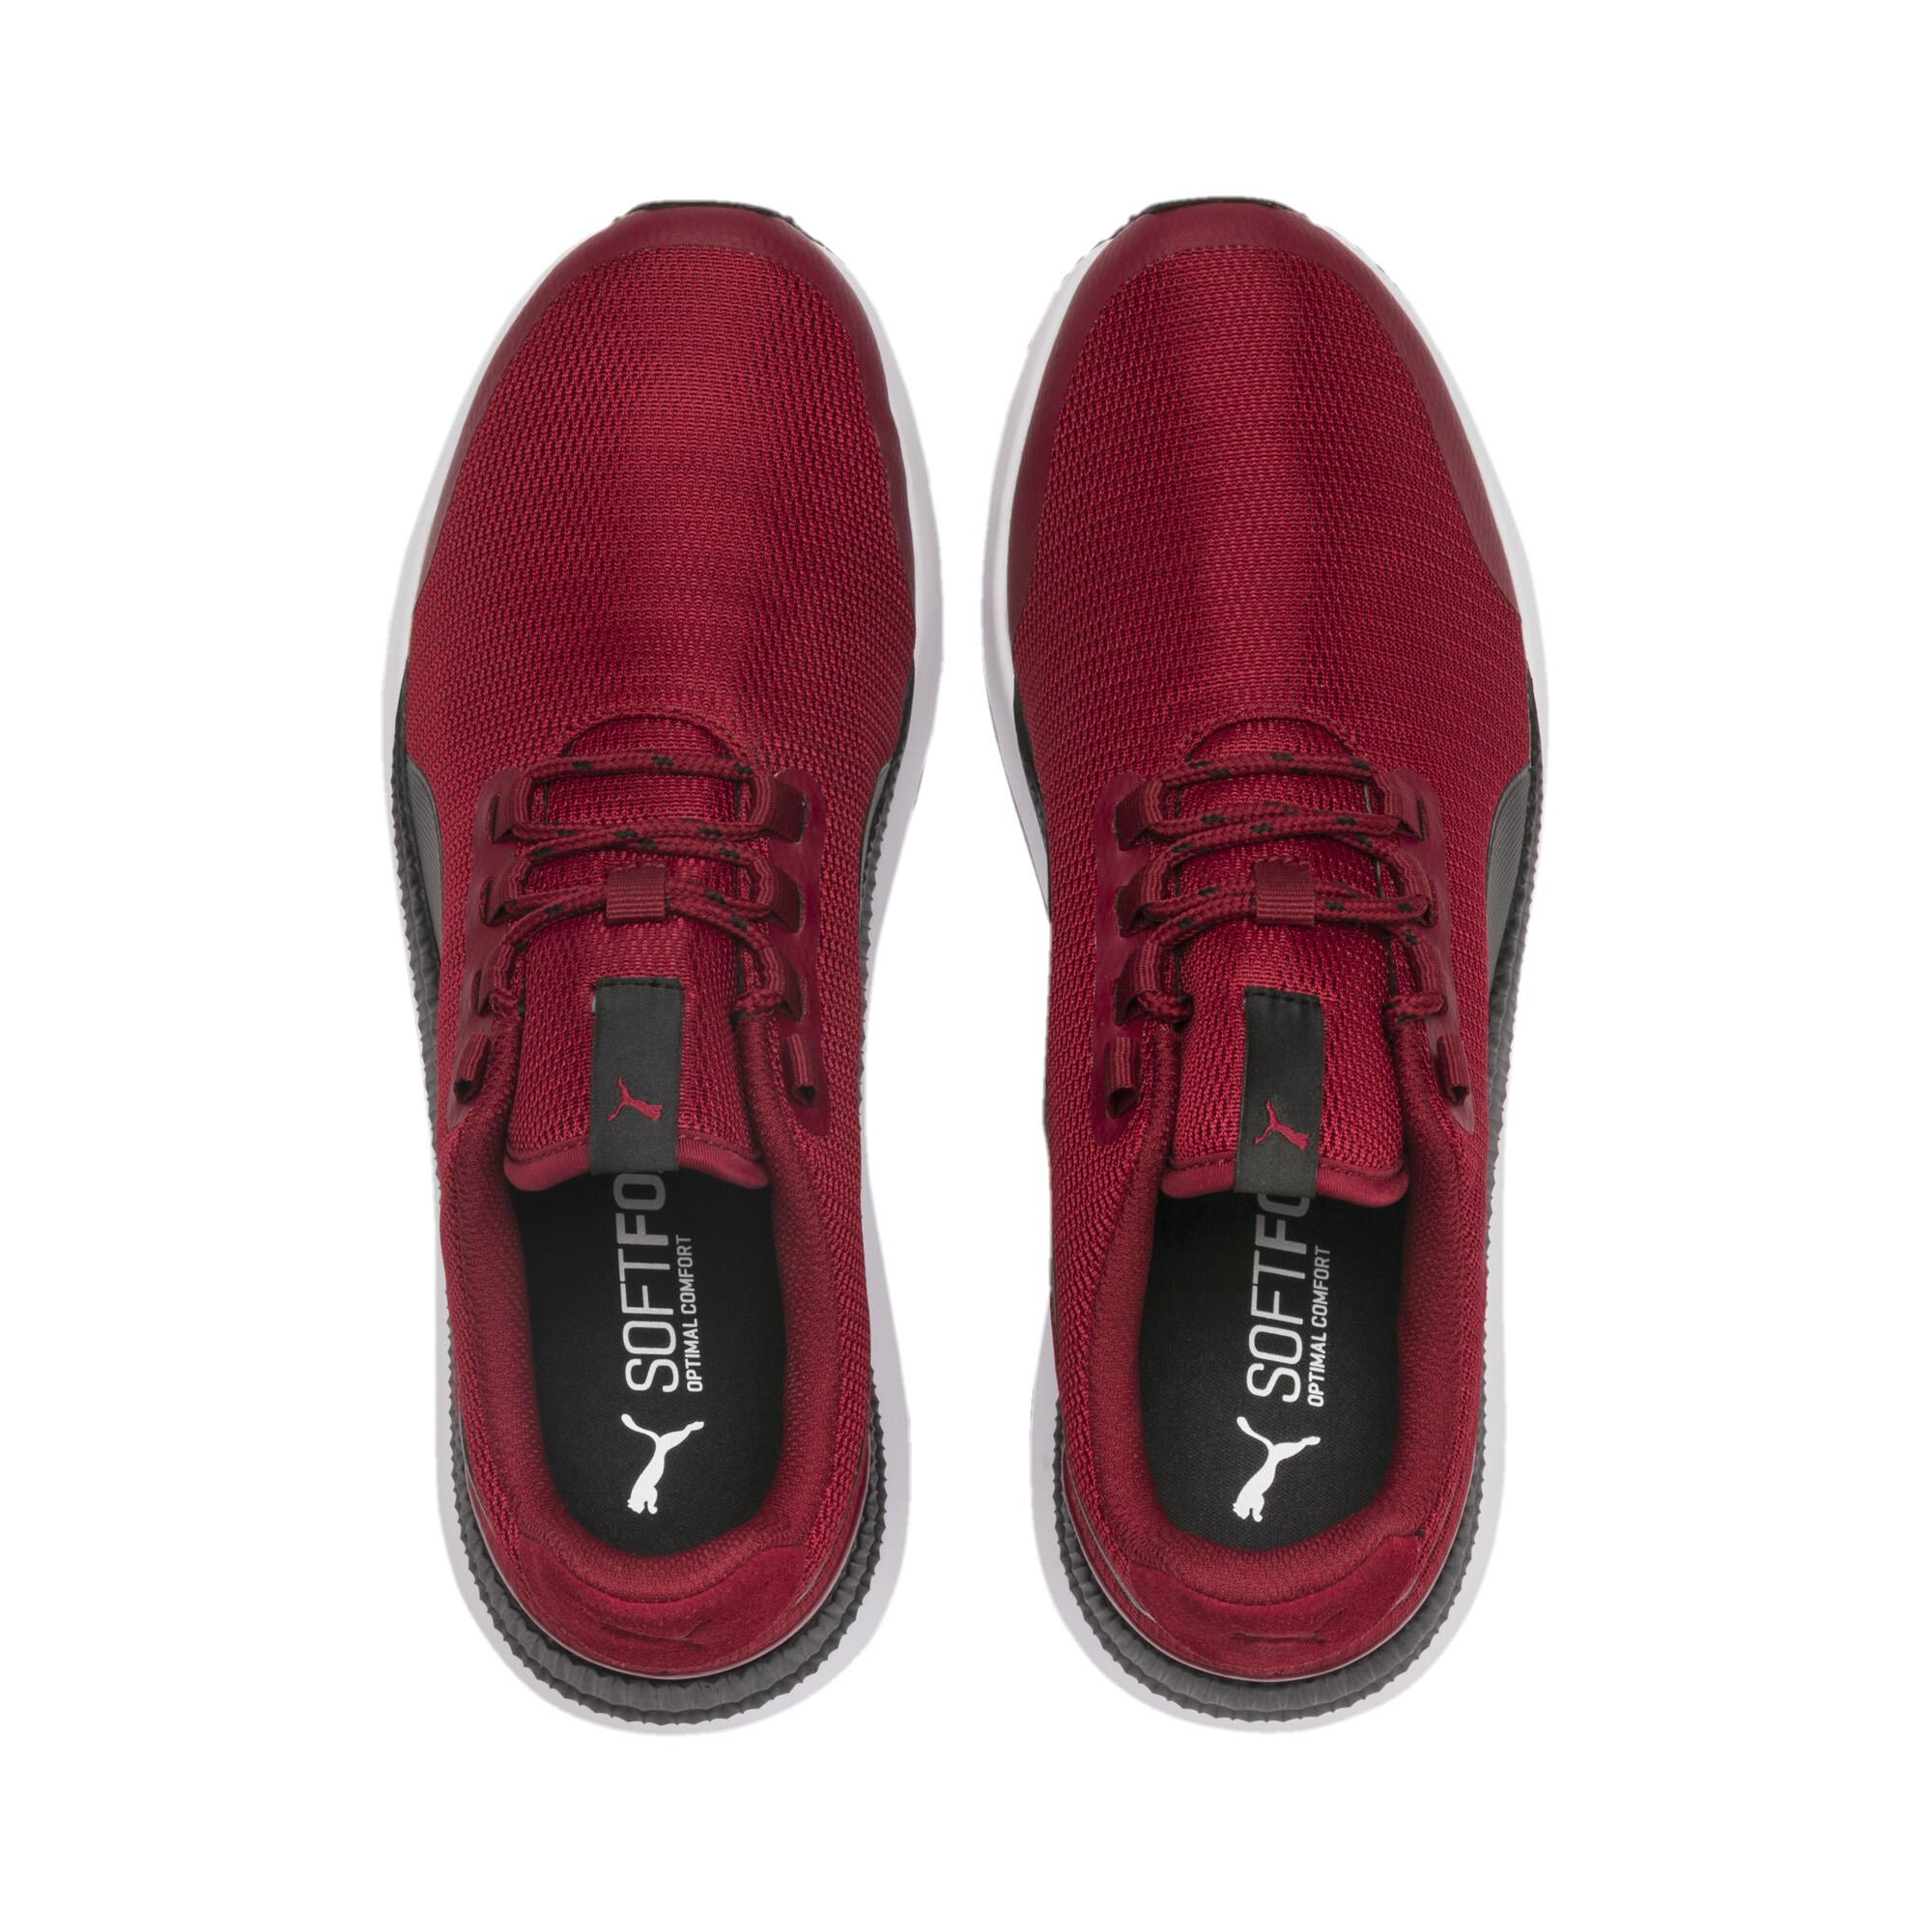 PUMA-Pacer-Next-FS-Men-039-s-Sneakers-Unisex-Shoe-Basics thumbnail 14